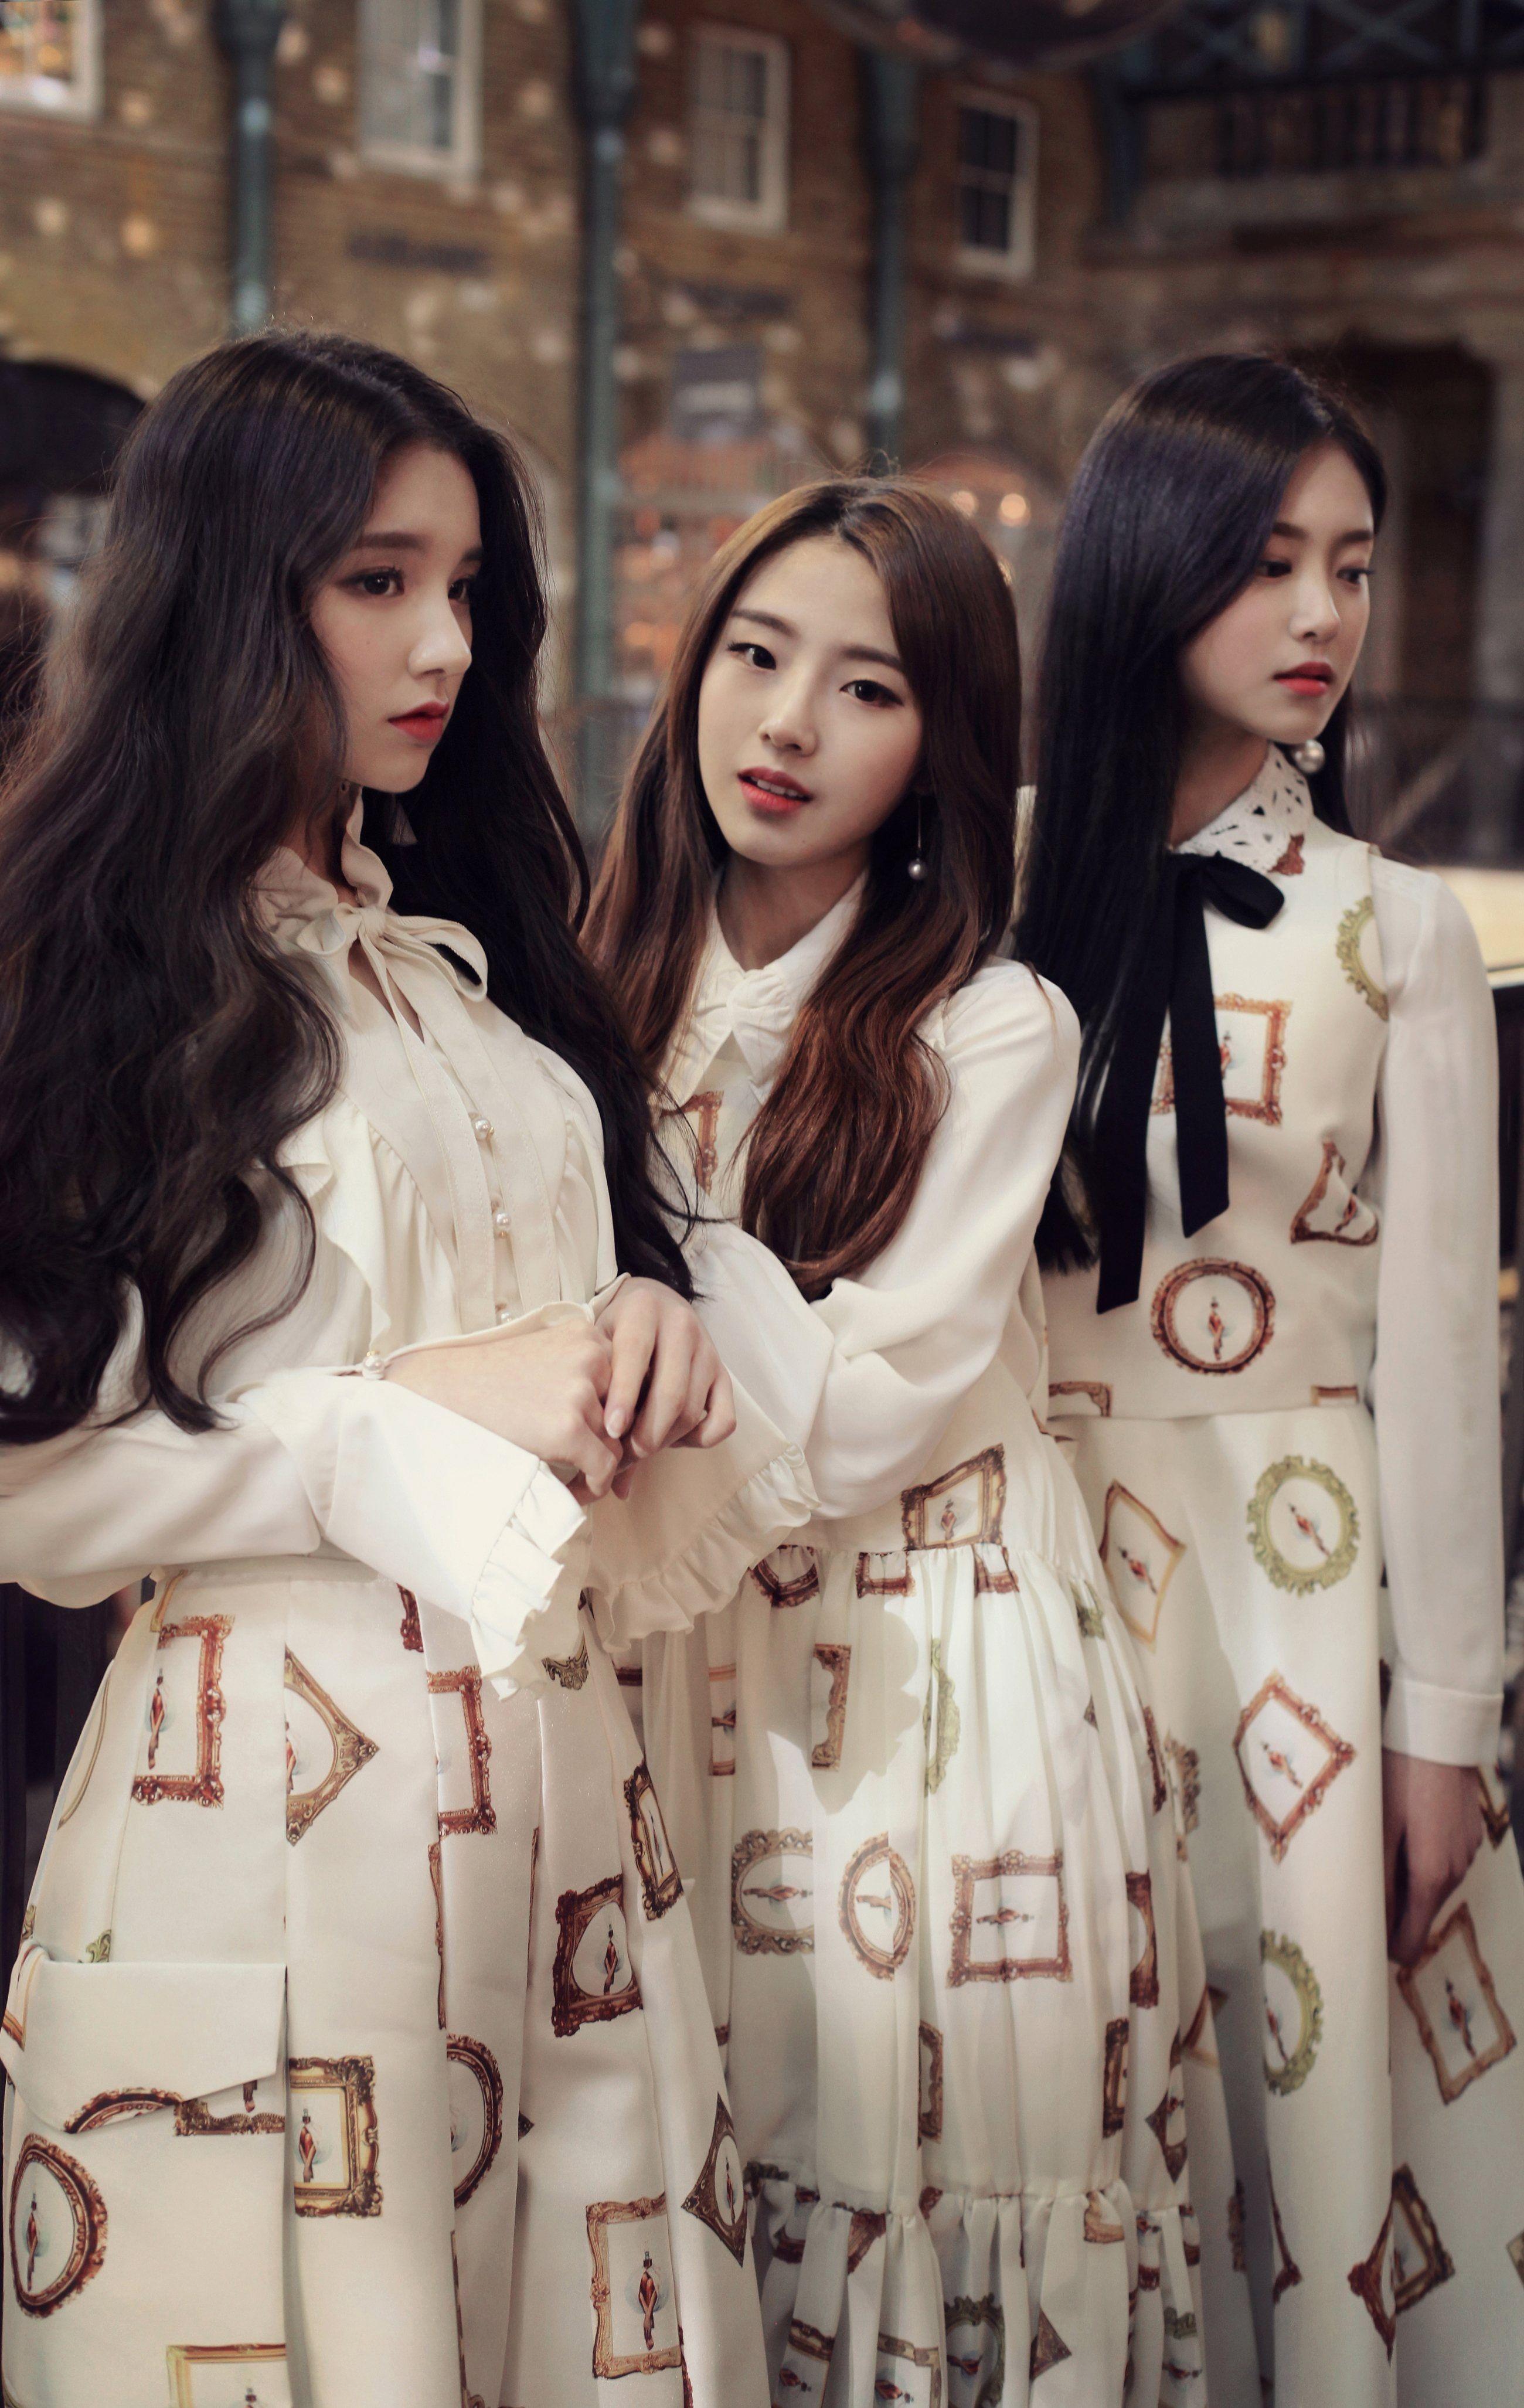 Loona K Pop Heejin Hyunjin Haseul Women 4k Wallpaper Hdwallpaper Desktop Women Kpop Girls Fashion Clothes Women